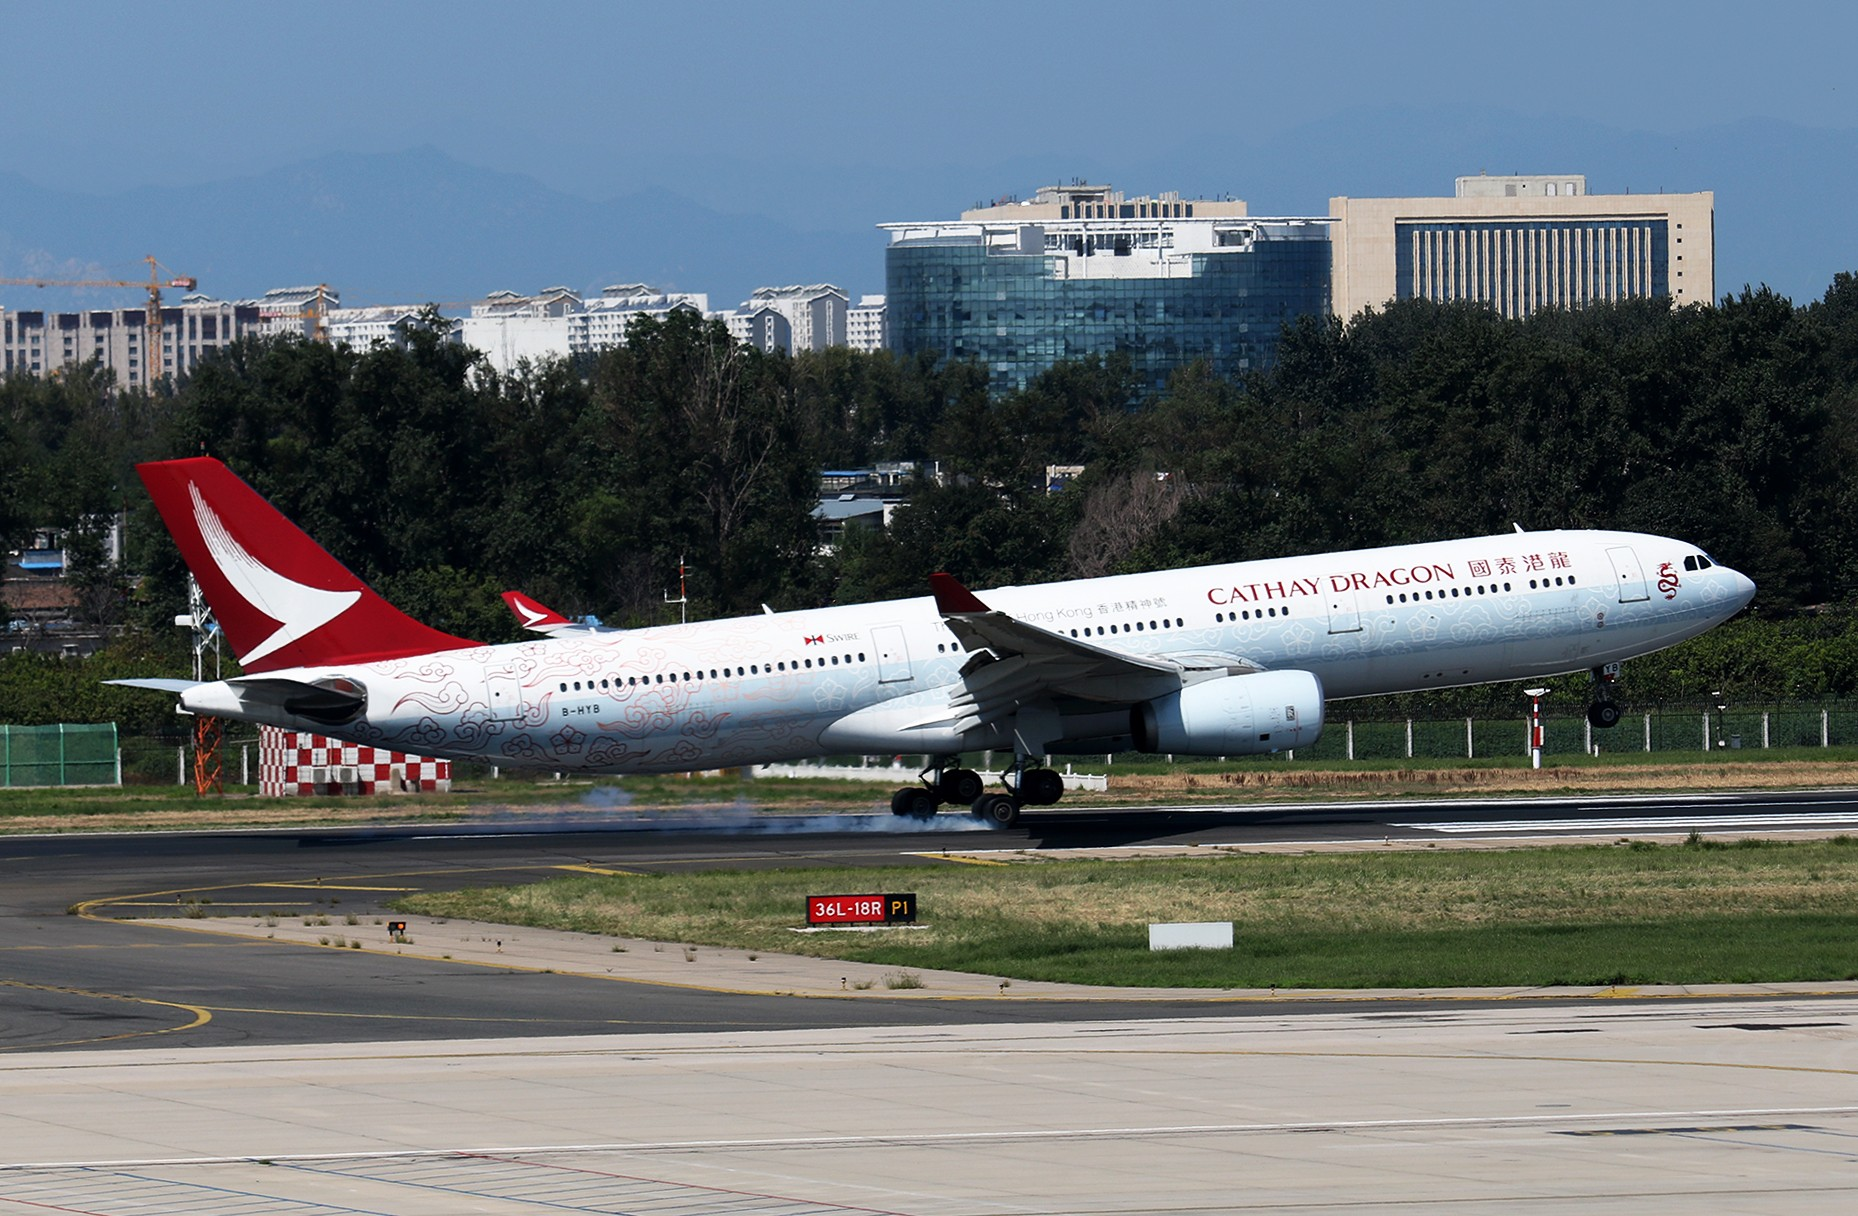 Re:[原创]LIULIU|【PEK】36L降落一组Ⅳ|擦烟 AIRBUS A330-300 B-HYB 中国北京首都国际机场